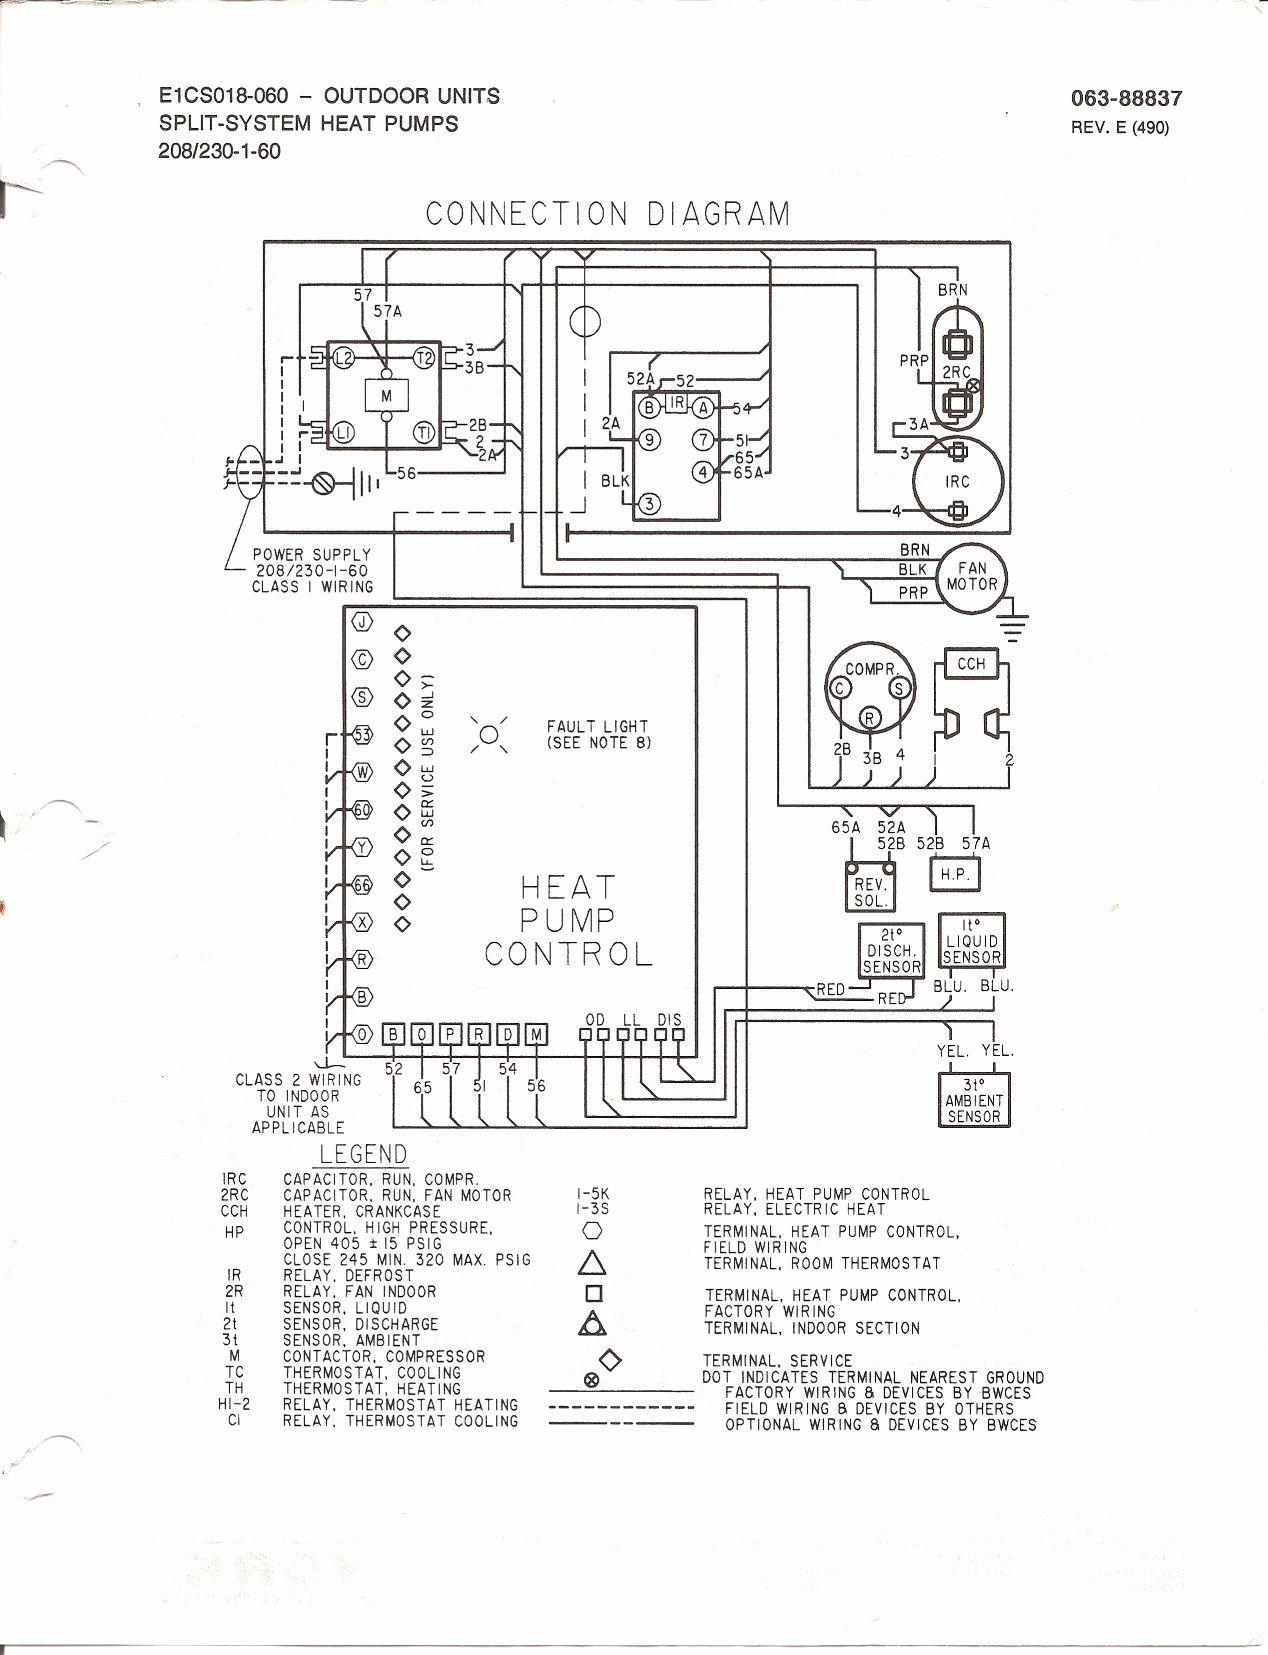 Goodman Heat Pump Thermostat Wiring Diagram Unique Heat Pump - Goodman Heat Pump Thermostat Wiring Diagram